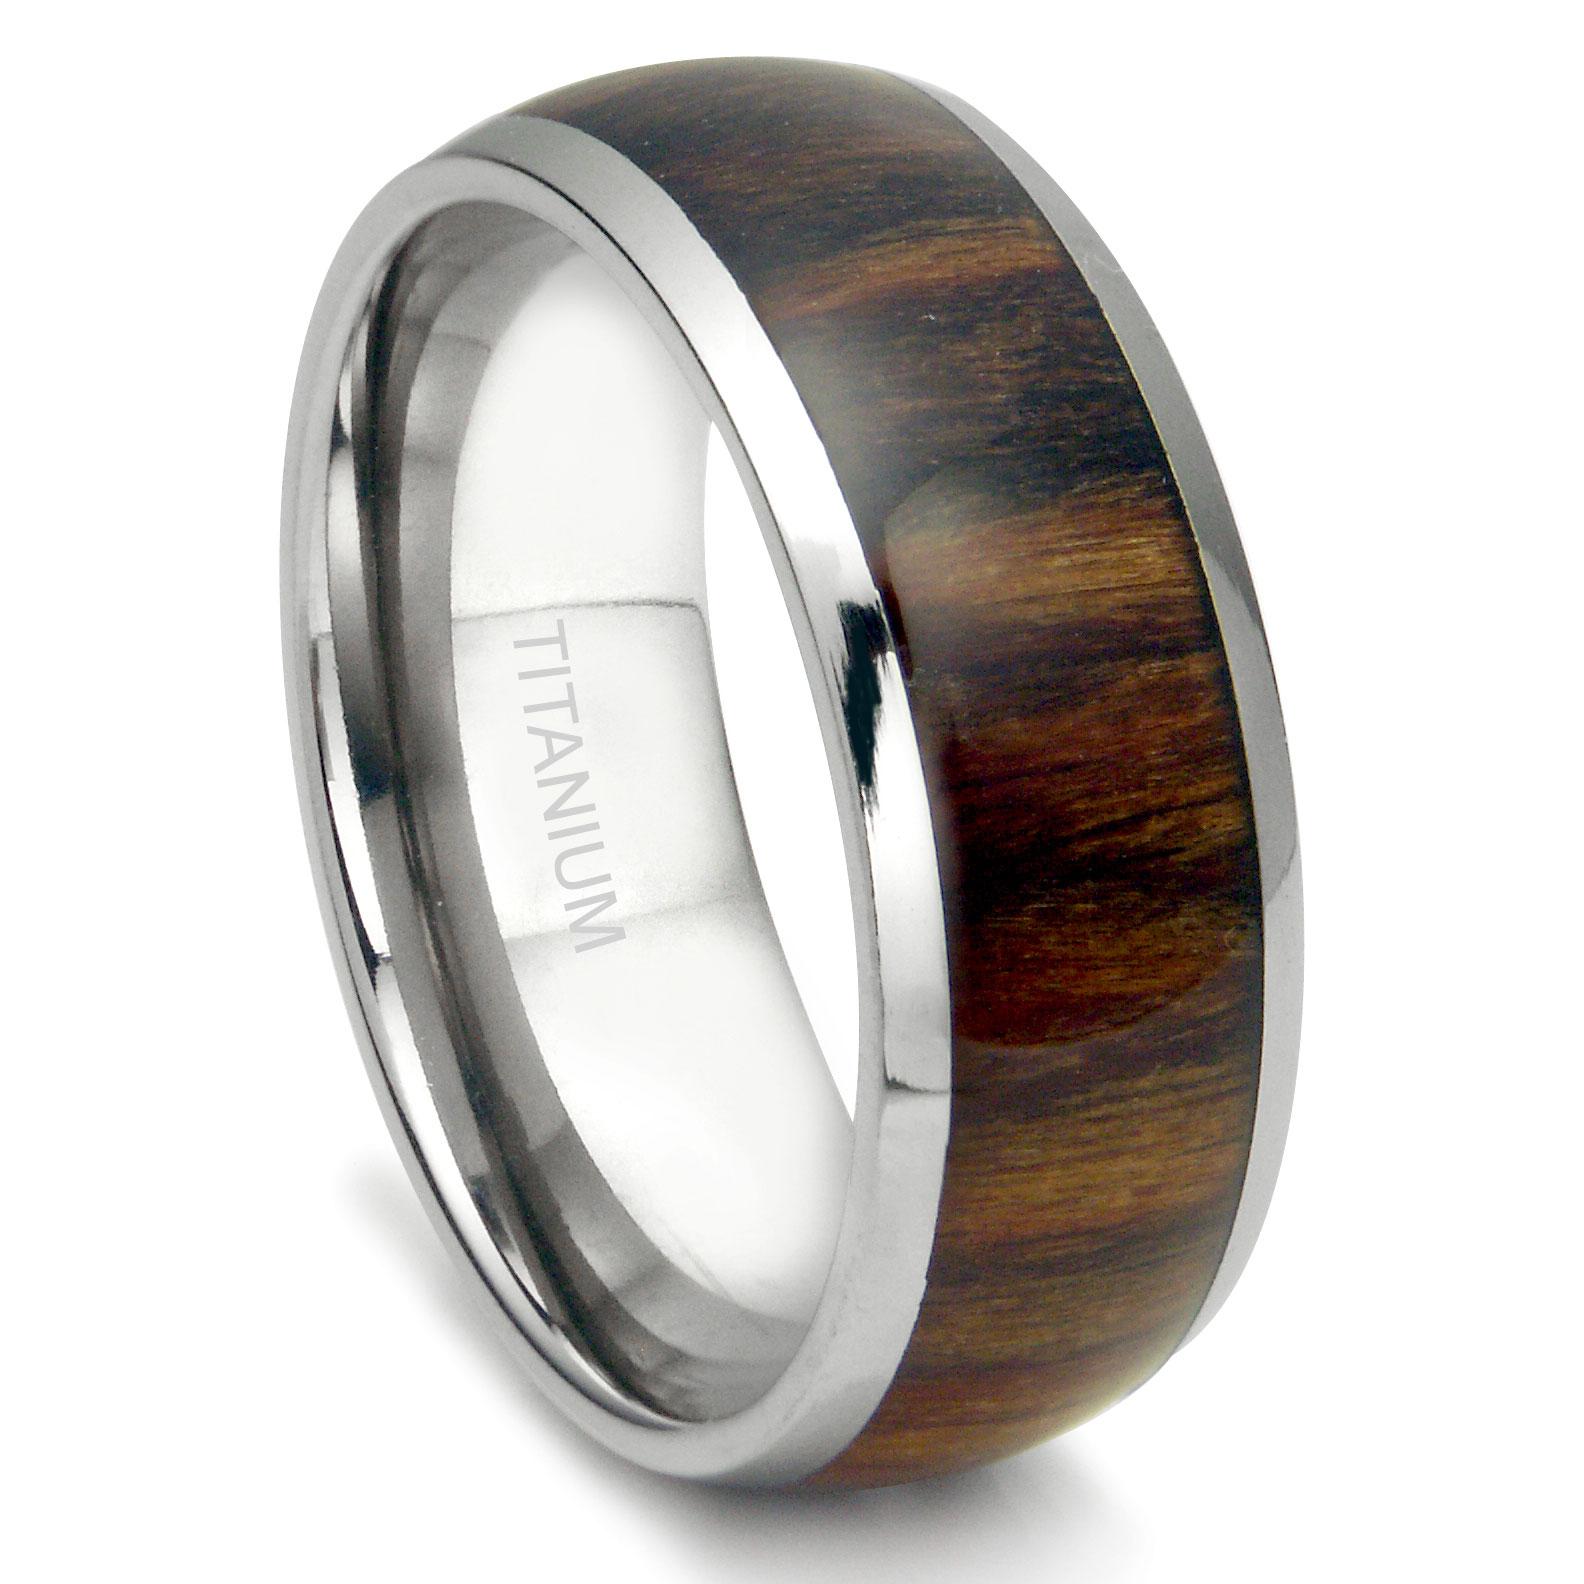 Mens Titanium Wedding Rings mens cable wedding band Titanium 8MM Domed Santos Rosewood Inlay Wedding Band Ring